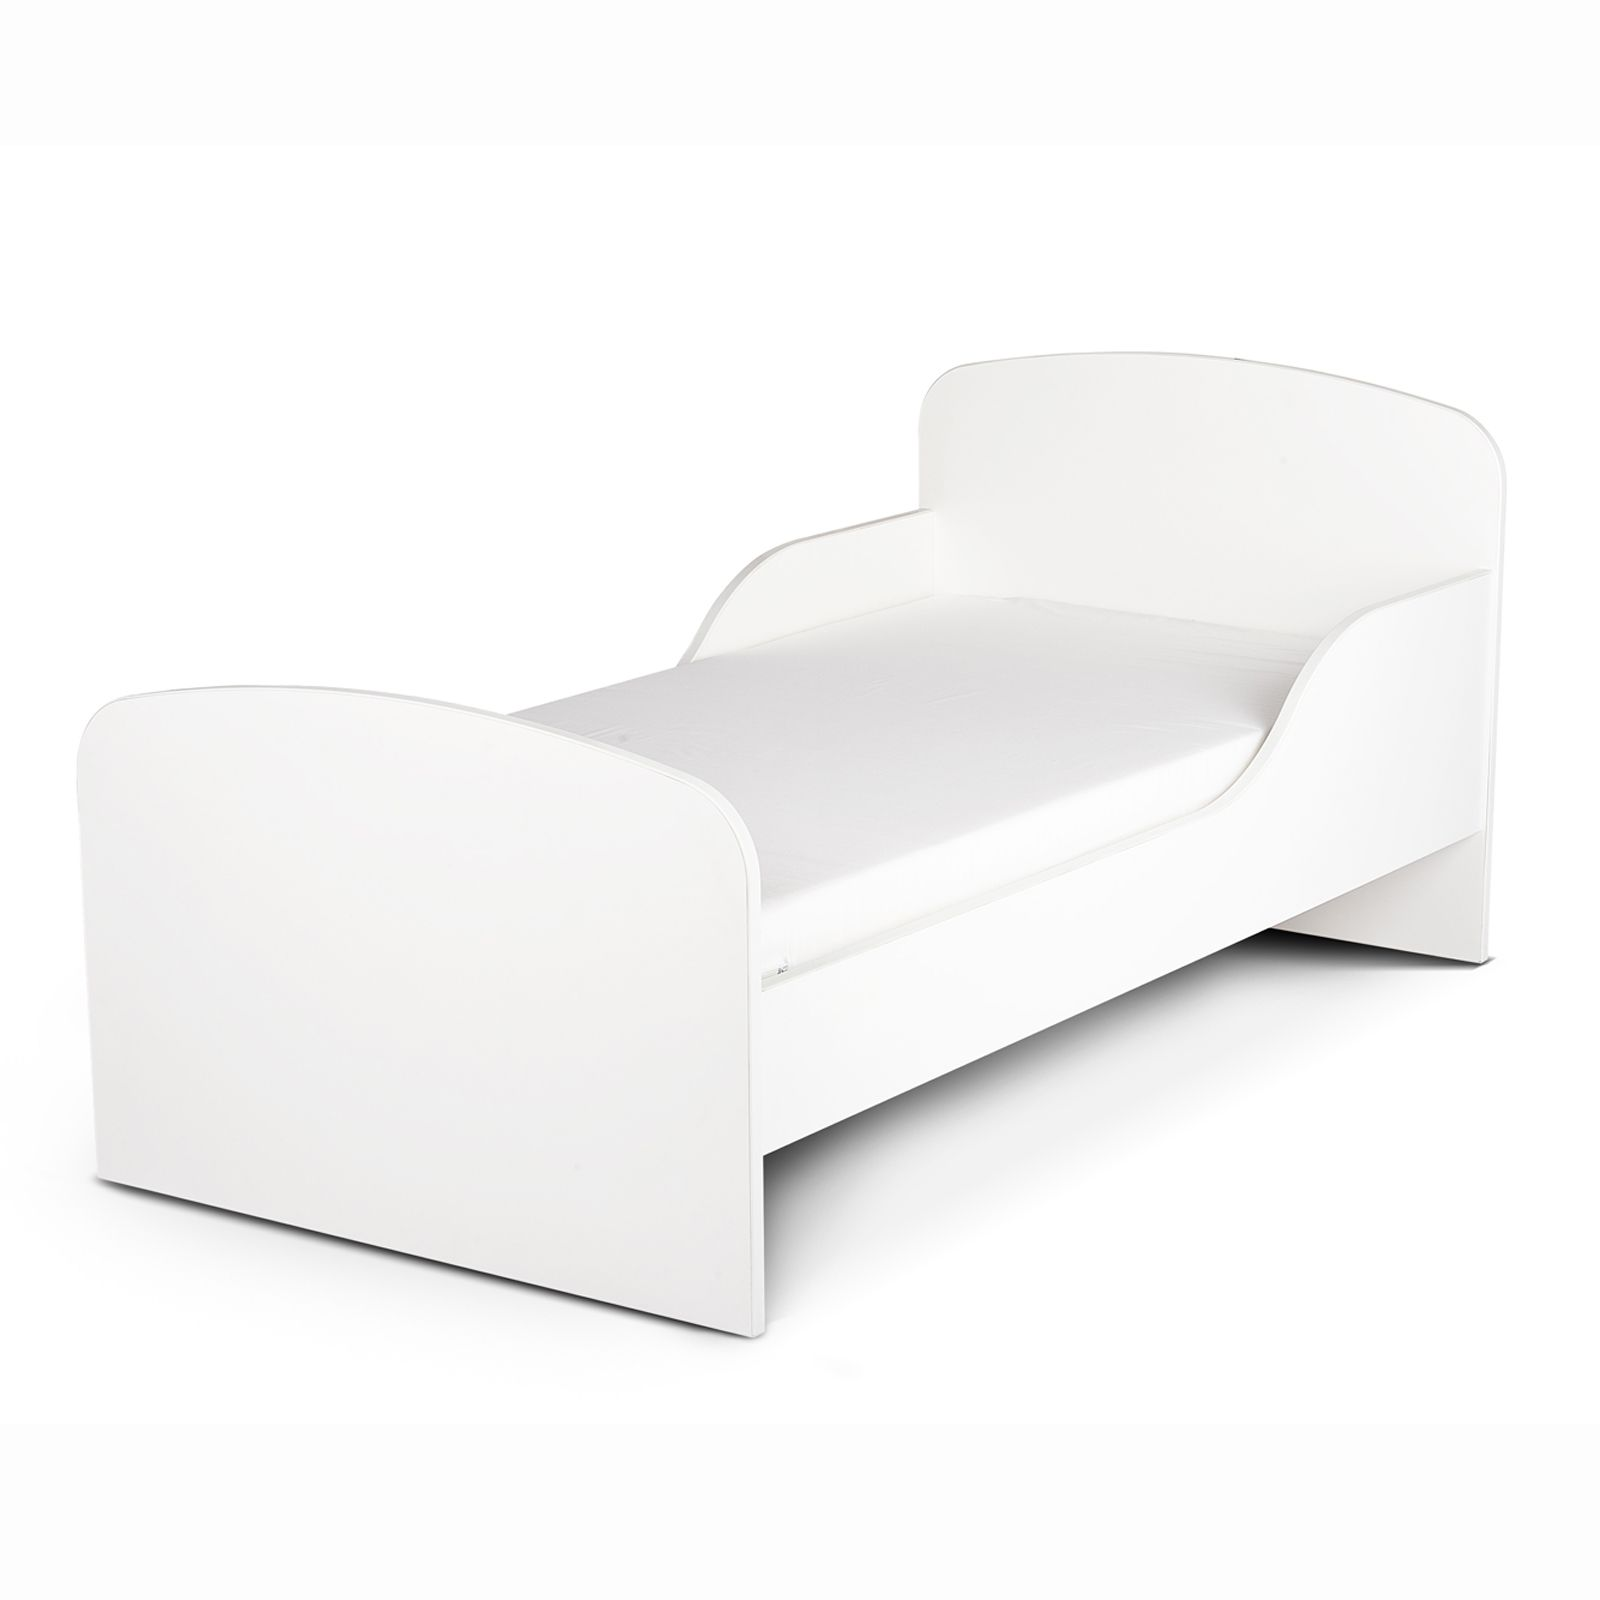 PLAIN WHITE MDF TODDLER BED NEW KIDS BEDROOM